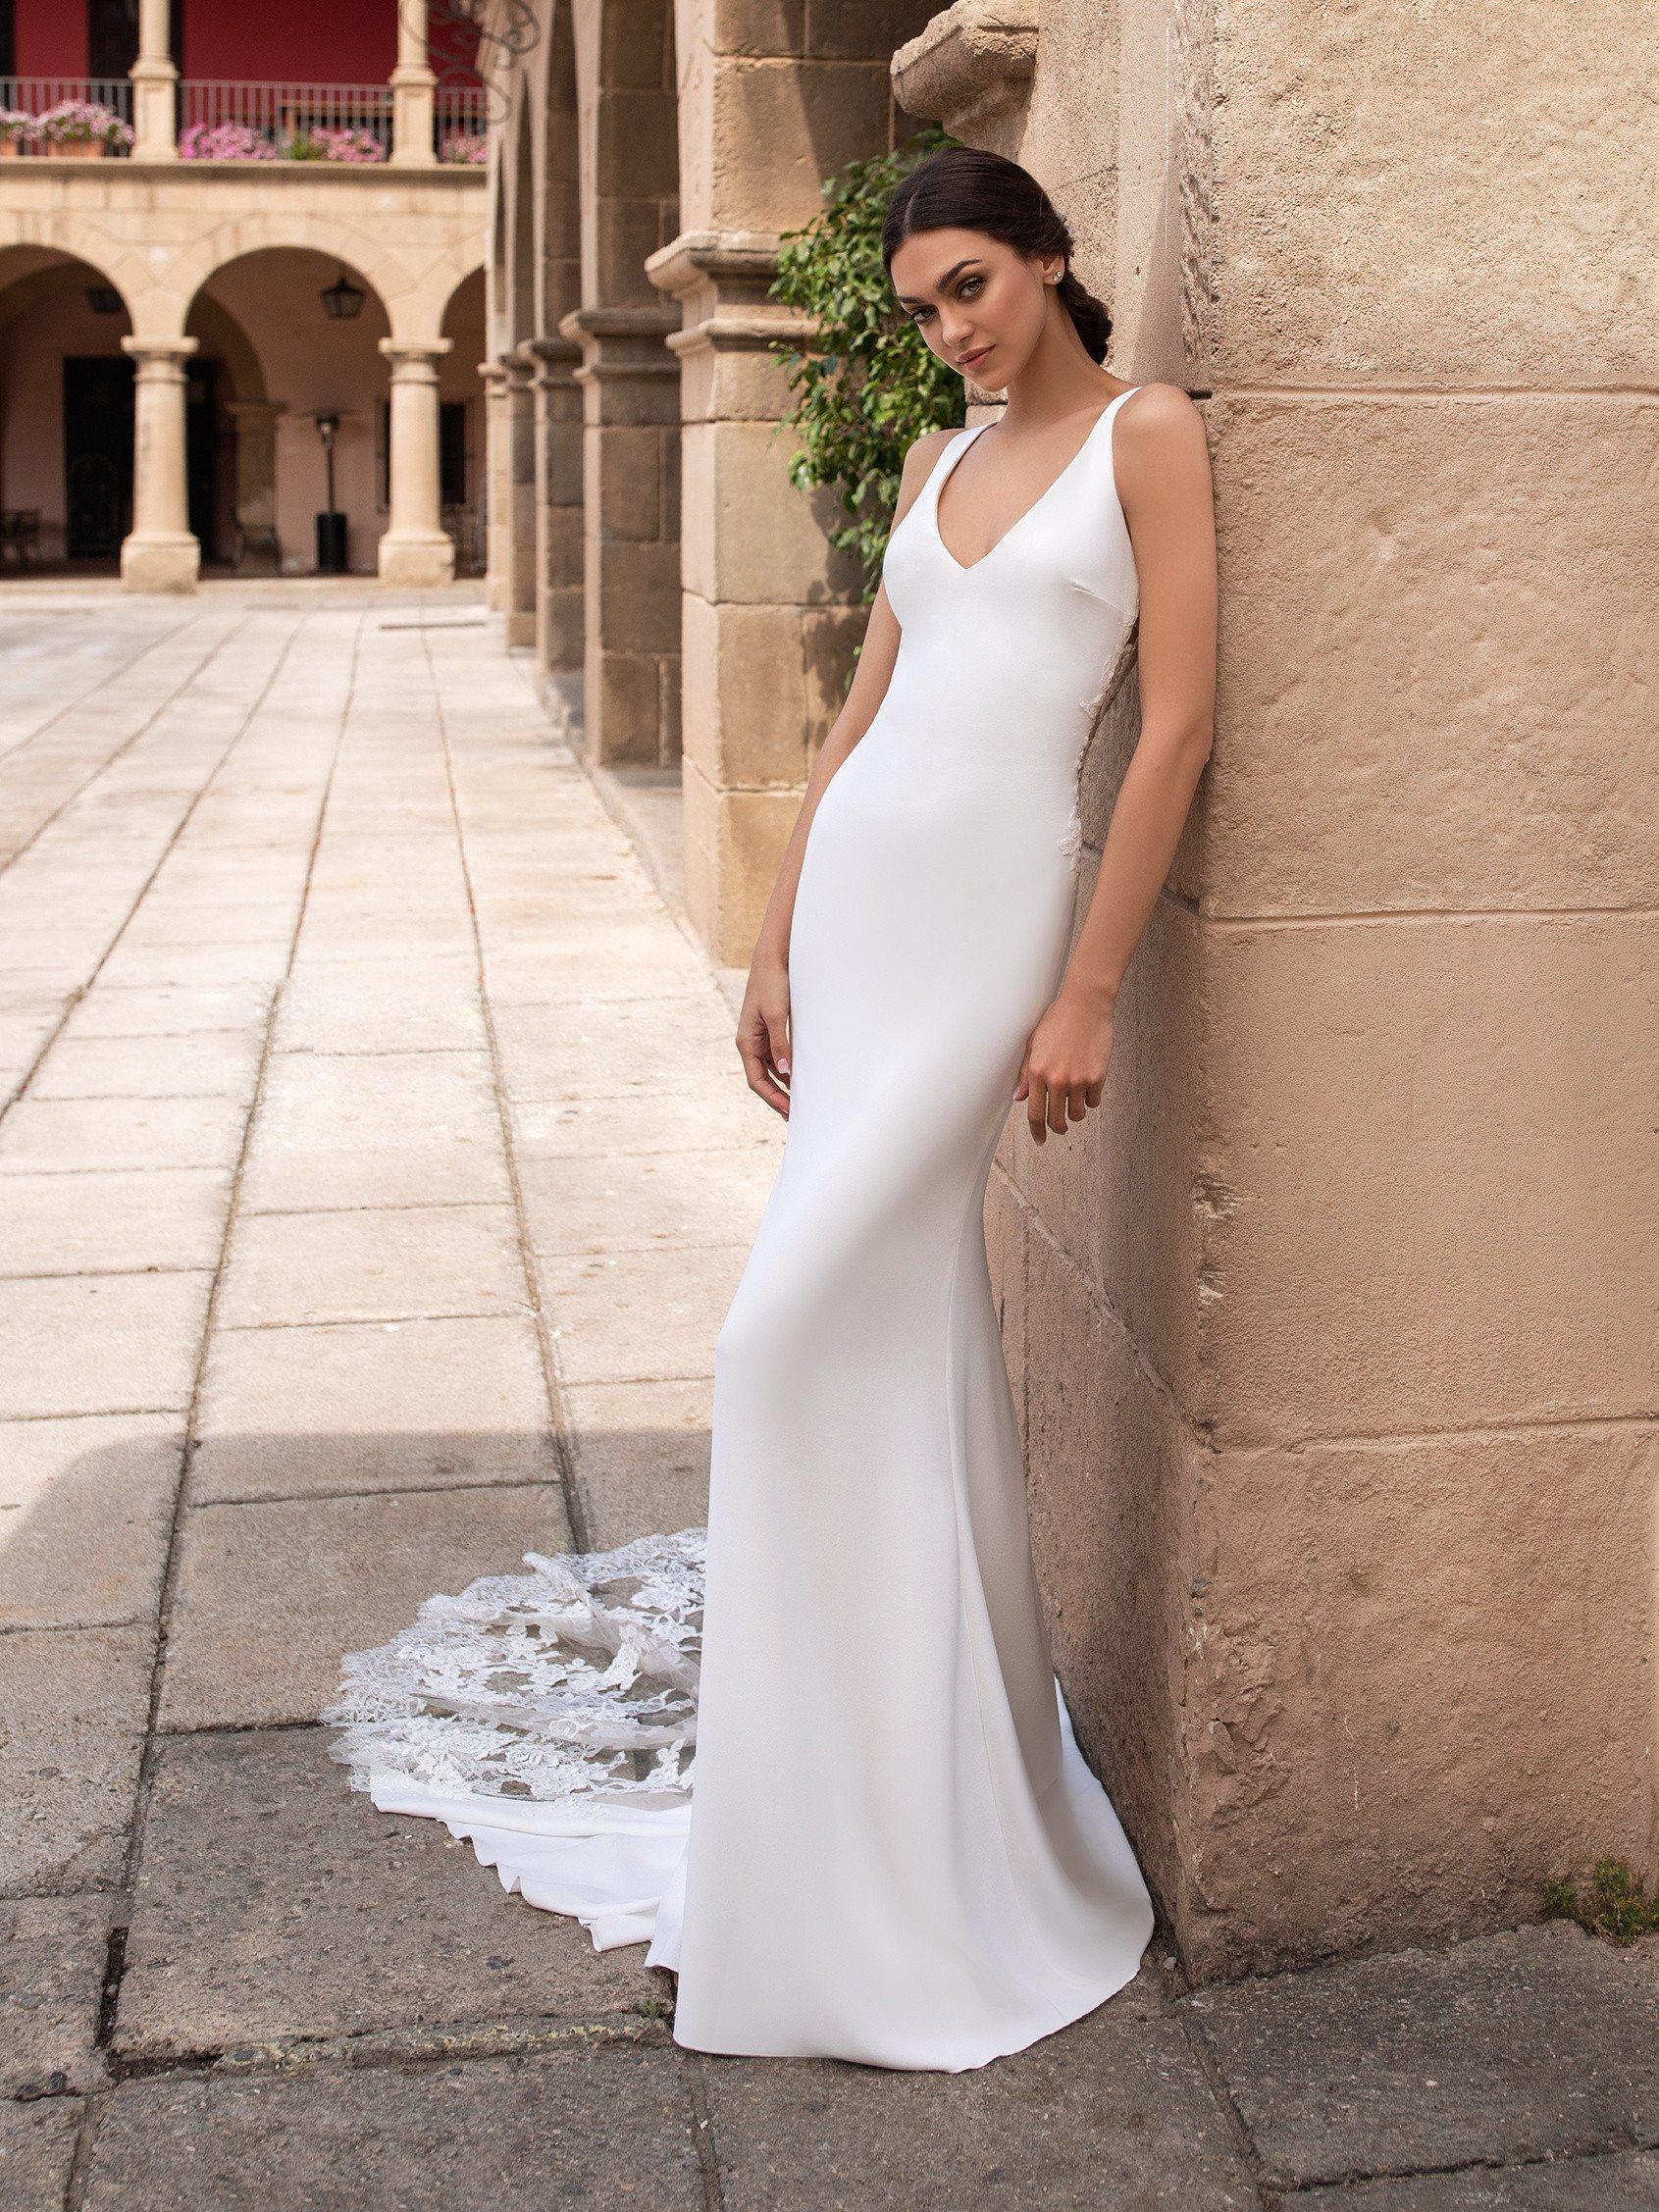 Iocaste menyasszonyi ruha - Pronovias 2021